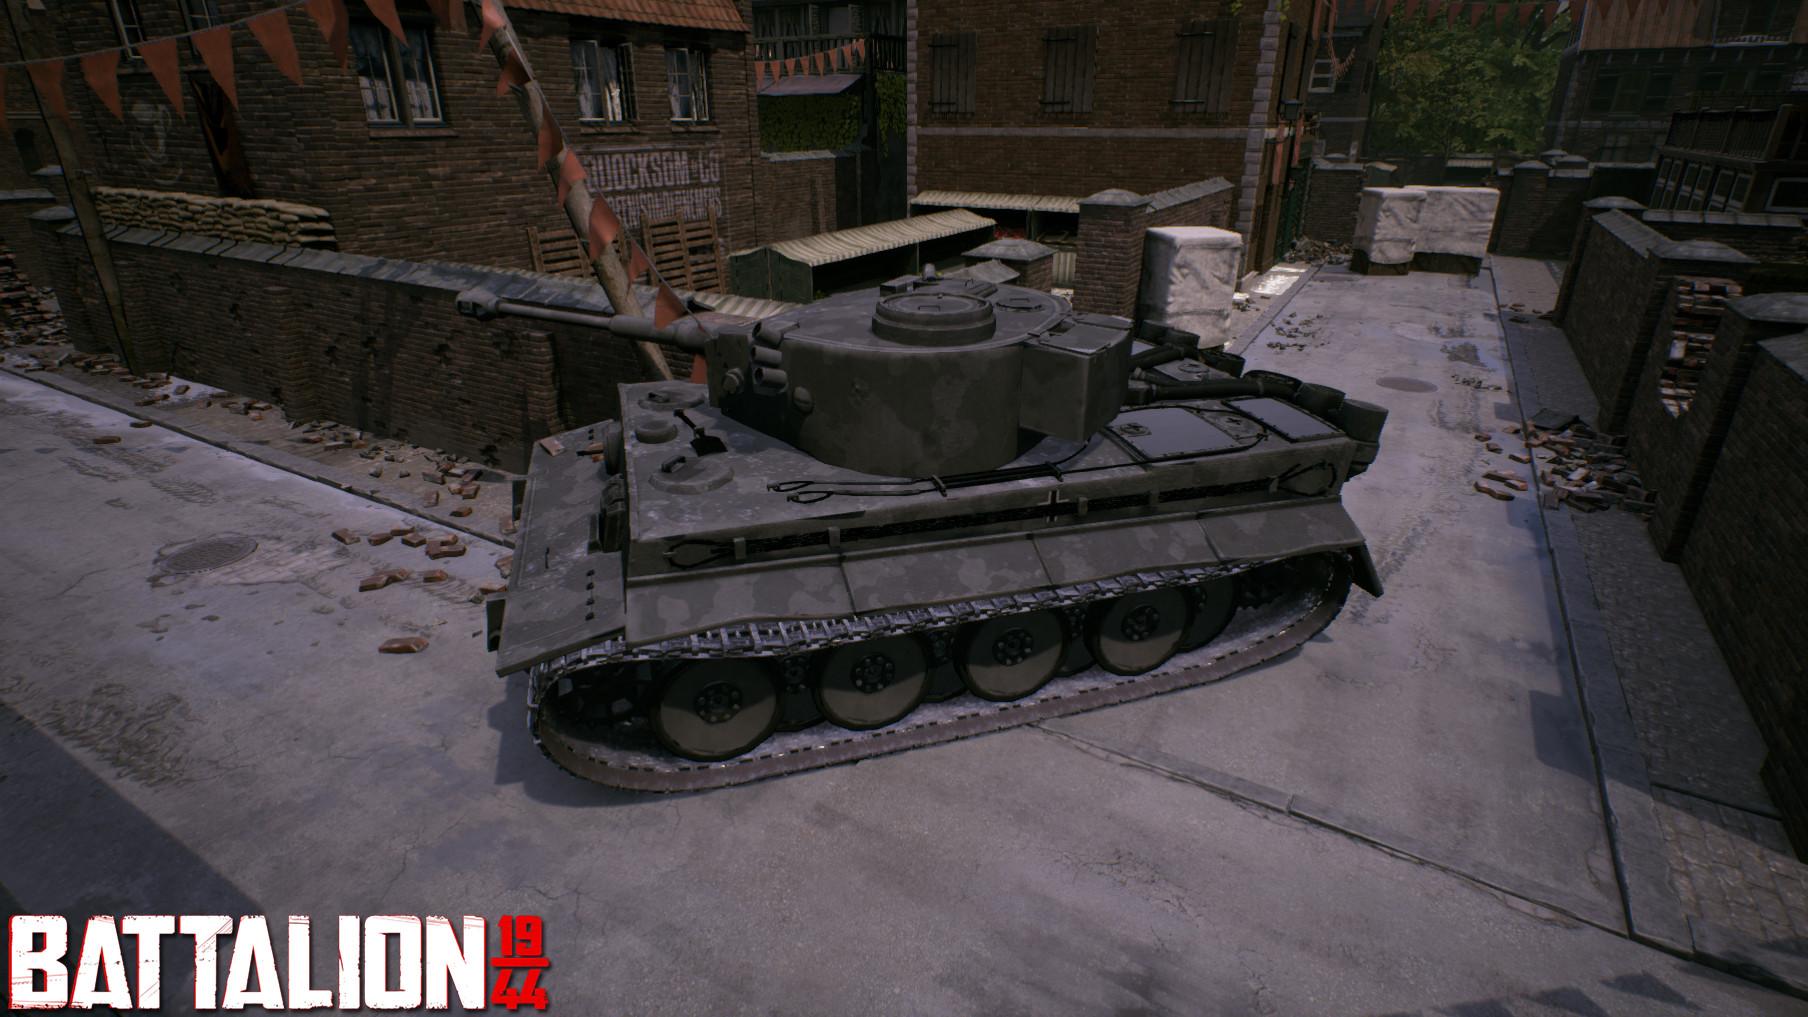 Jordan younie battalion 1944 screenshot 2018 02 25 18 55 31 11